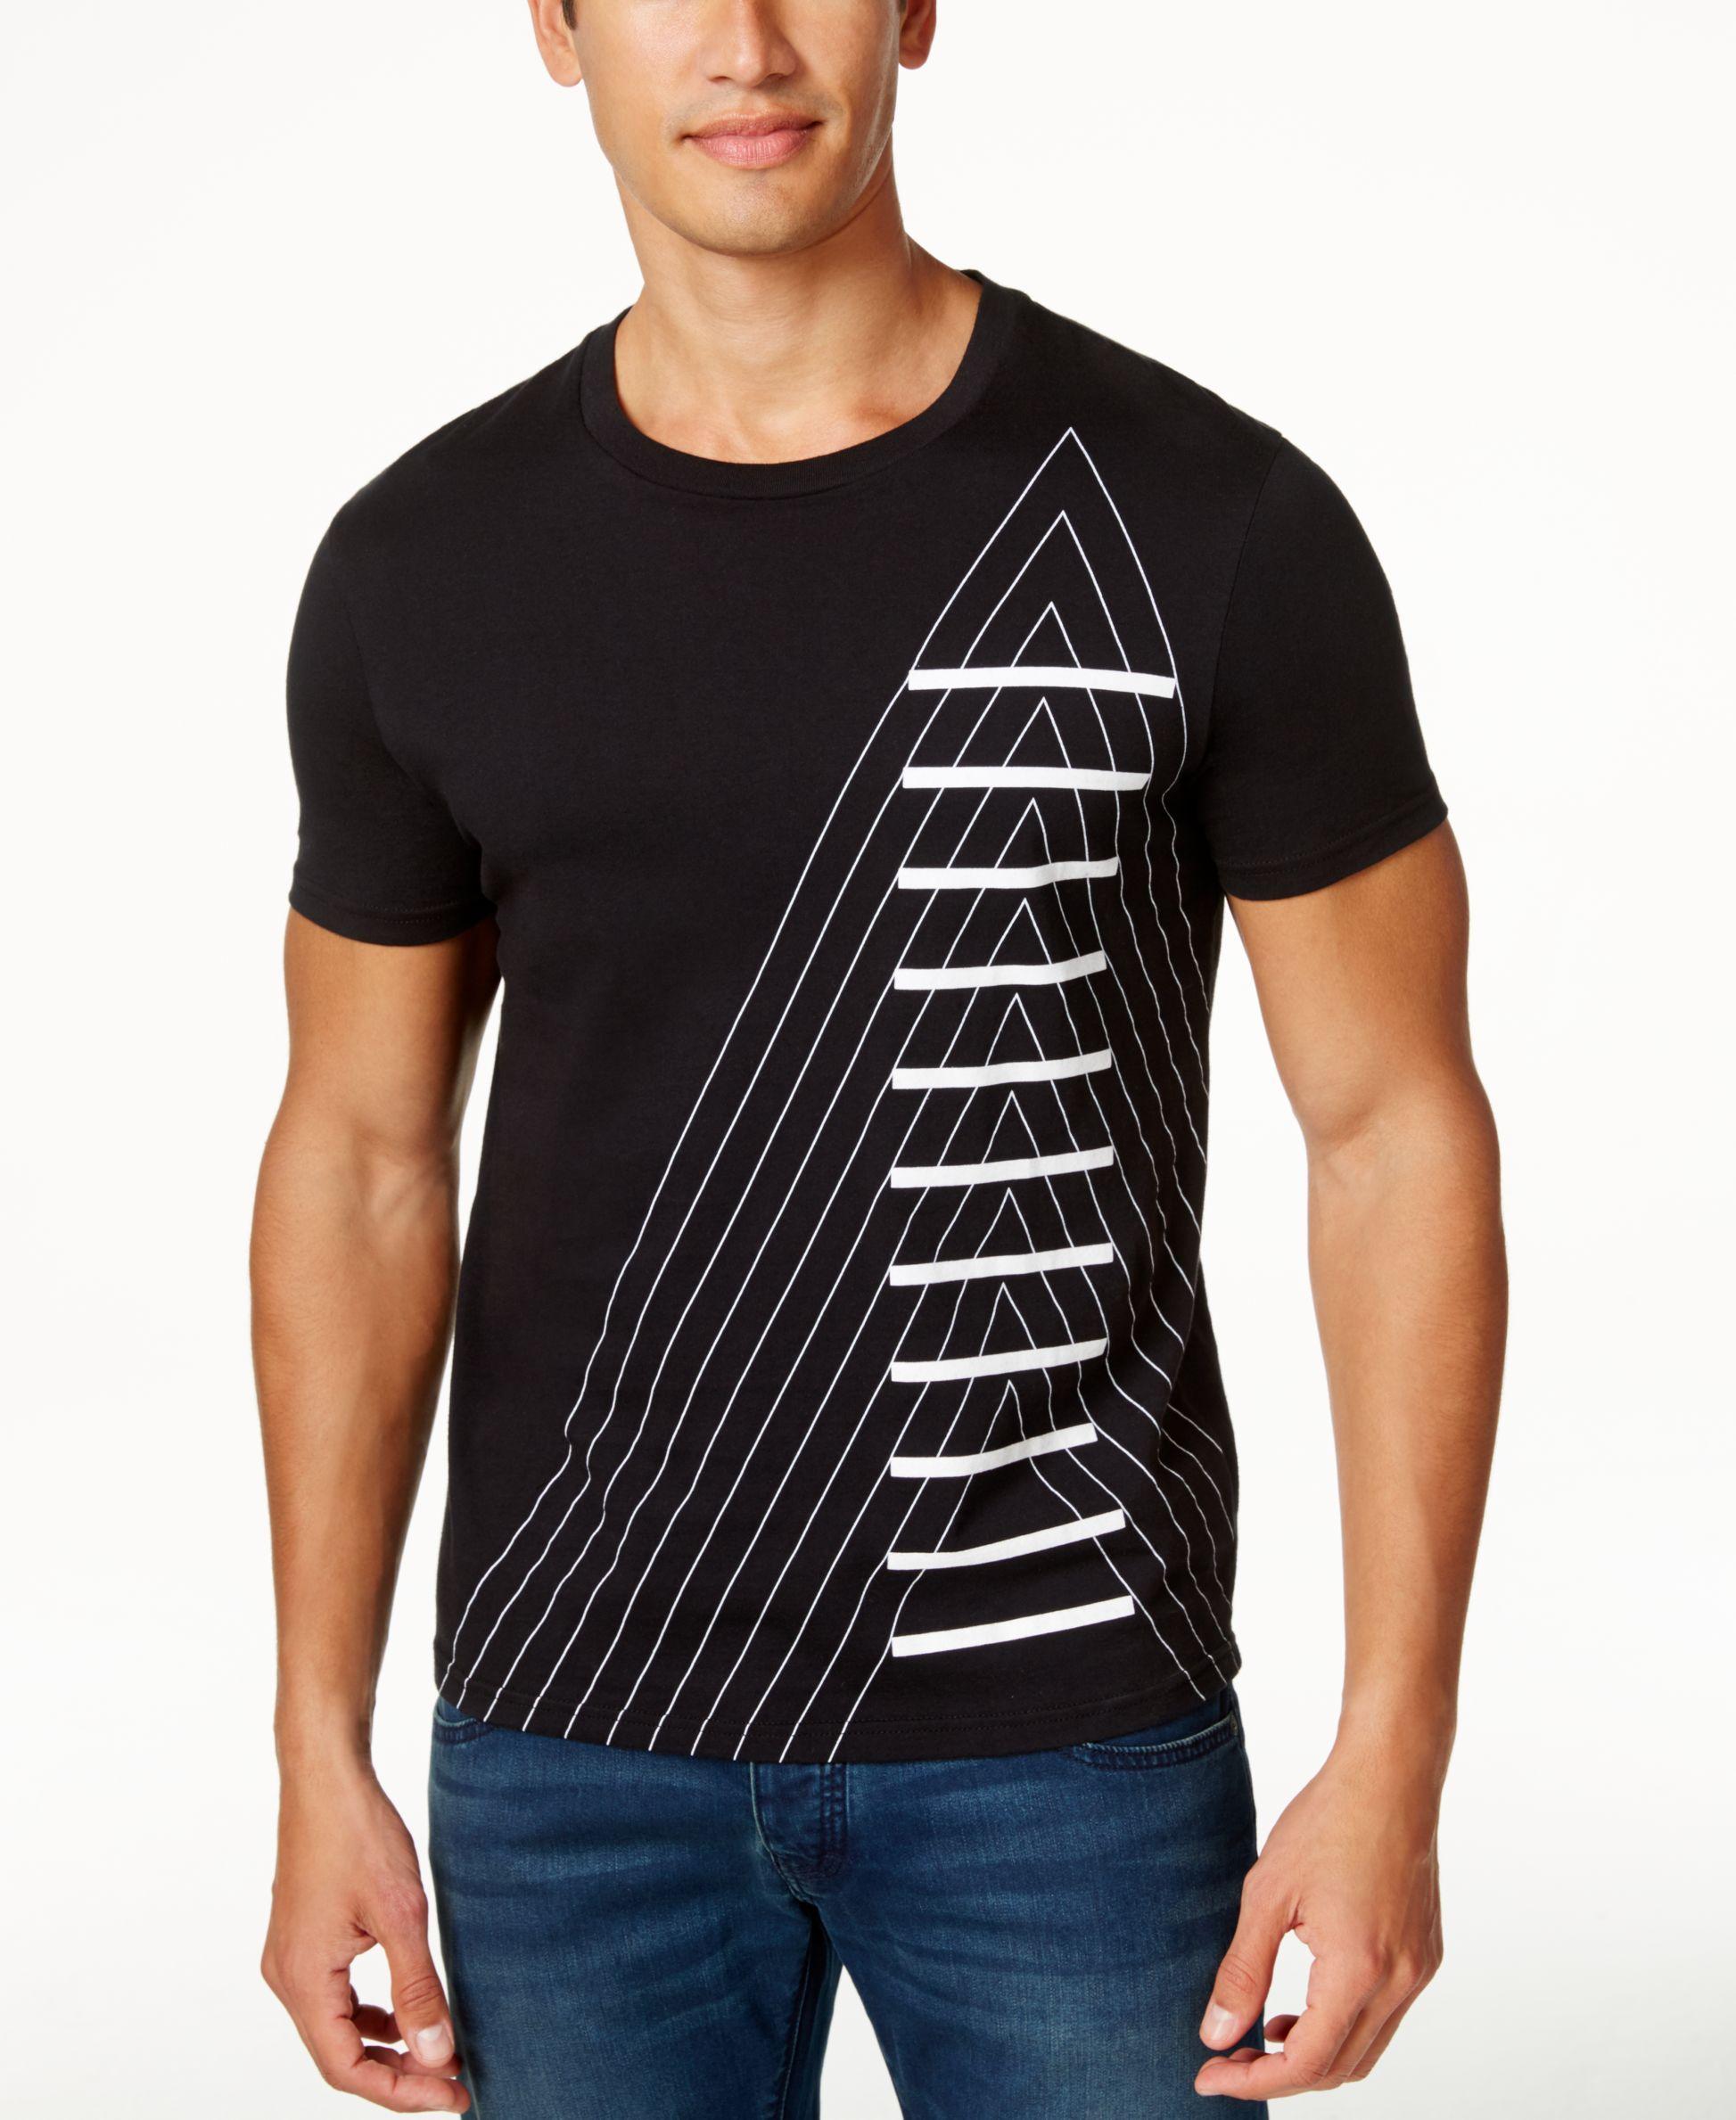 218447b96a65c Armani Exchange Men s A-Stacked Graphic-Print T-Shirt